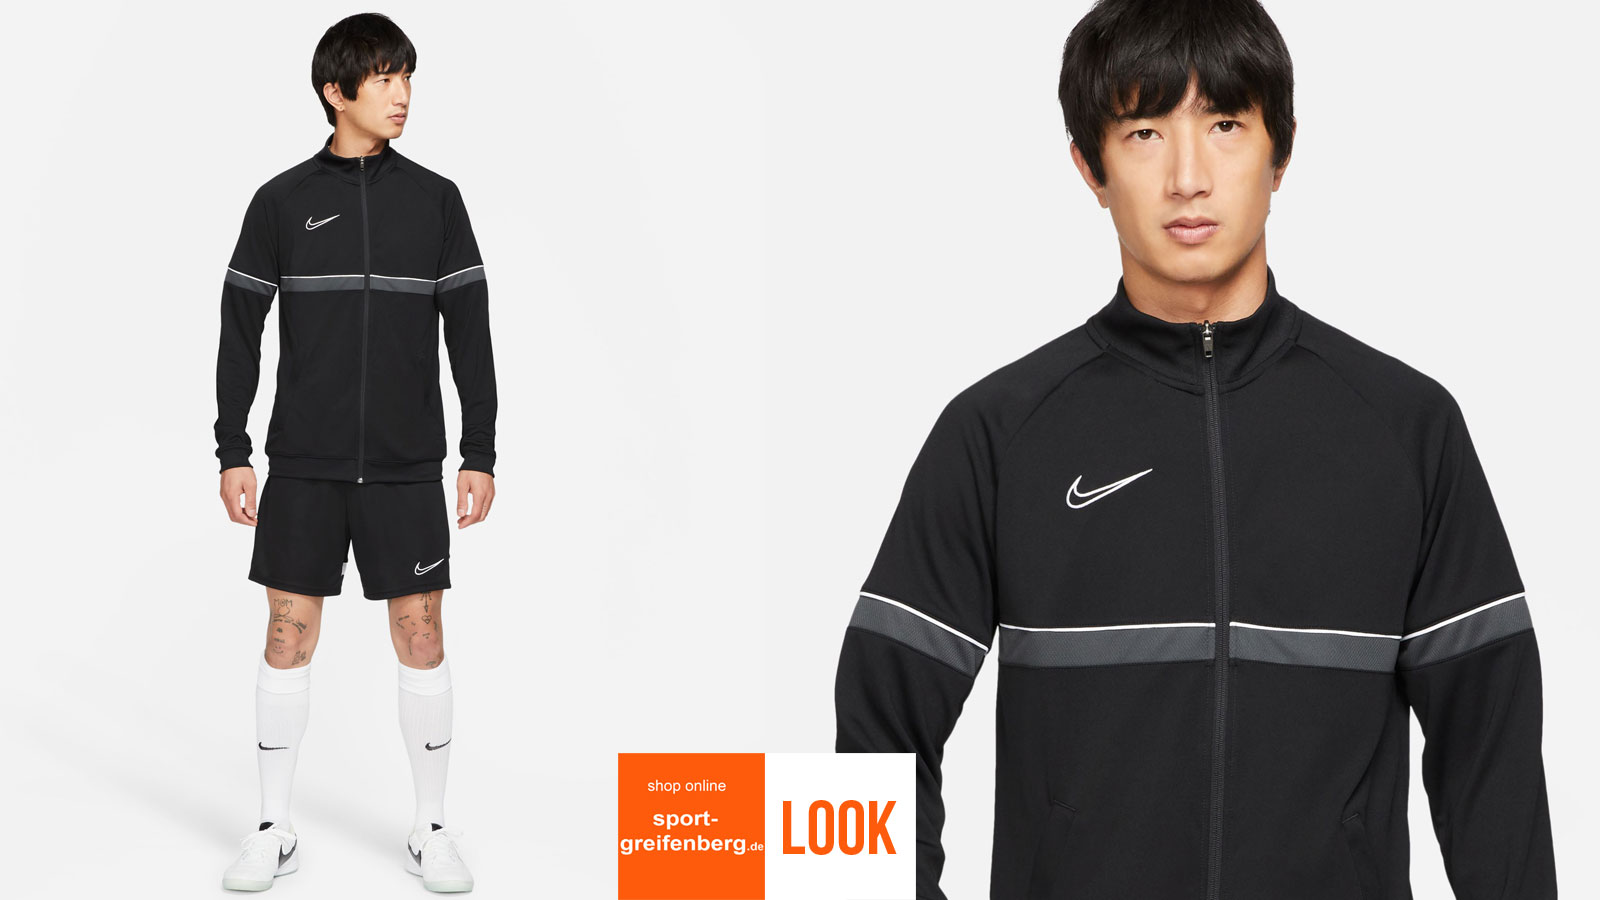 Das Nike Academy Training Outfit schwarz mit Trainingsjacke und Short